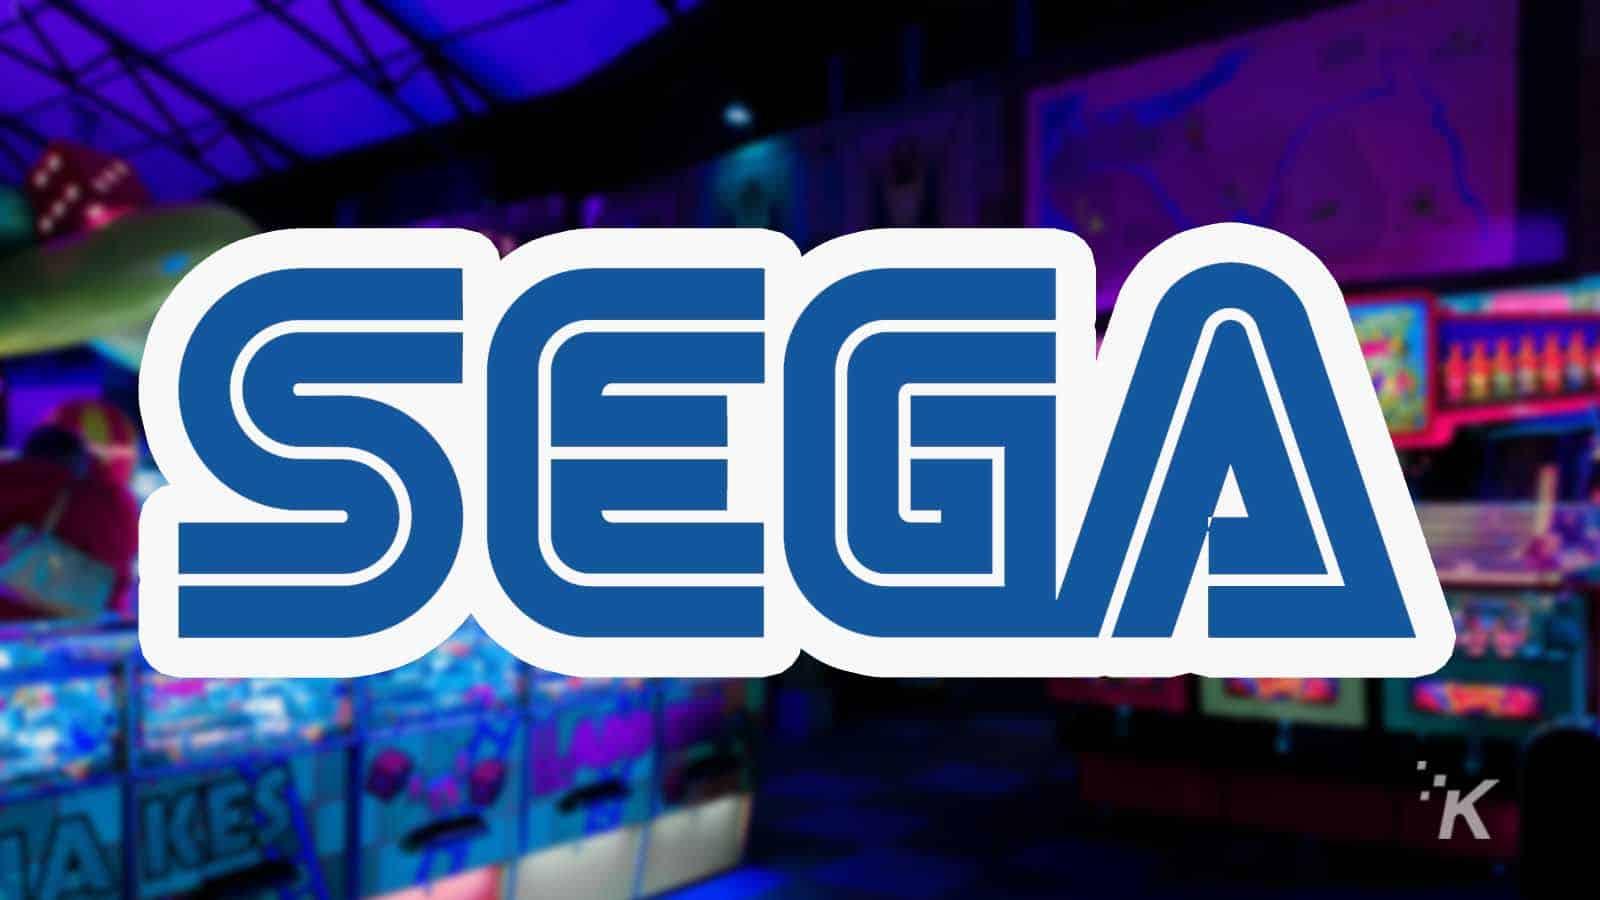 sega logo with arcade in background